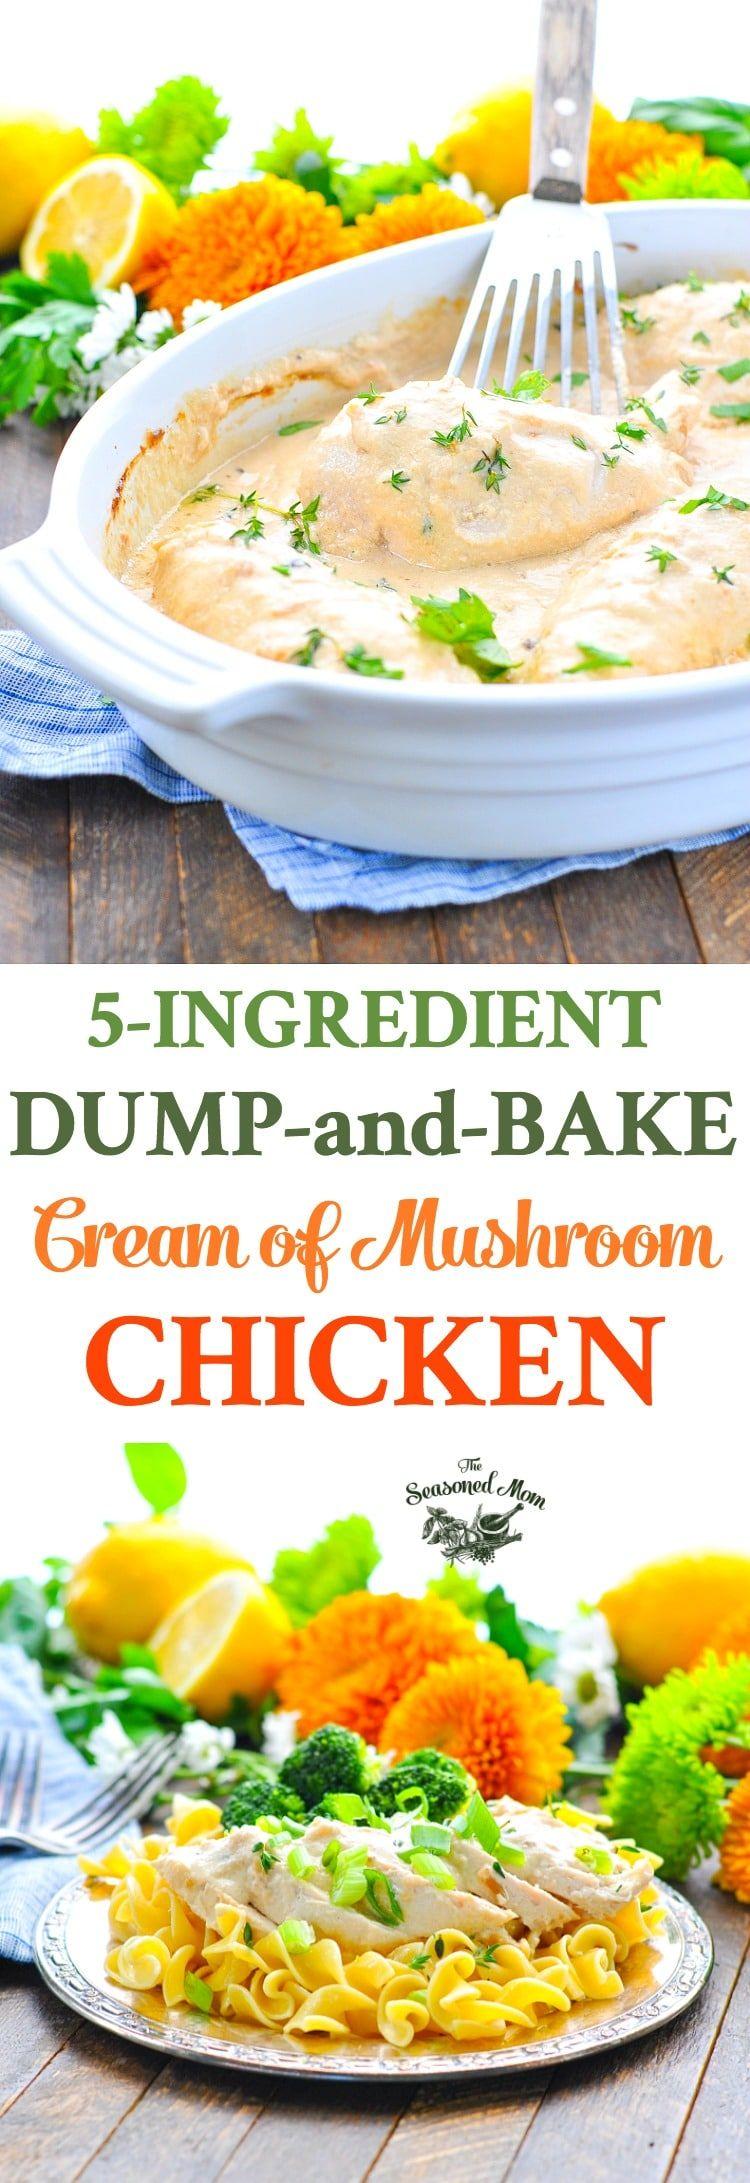 Dump-and-Bake Cream of Mushroom Chicken